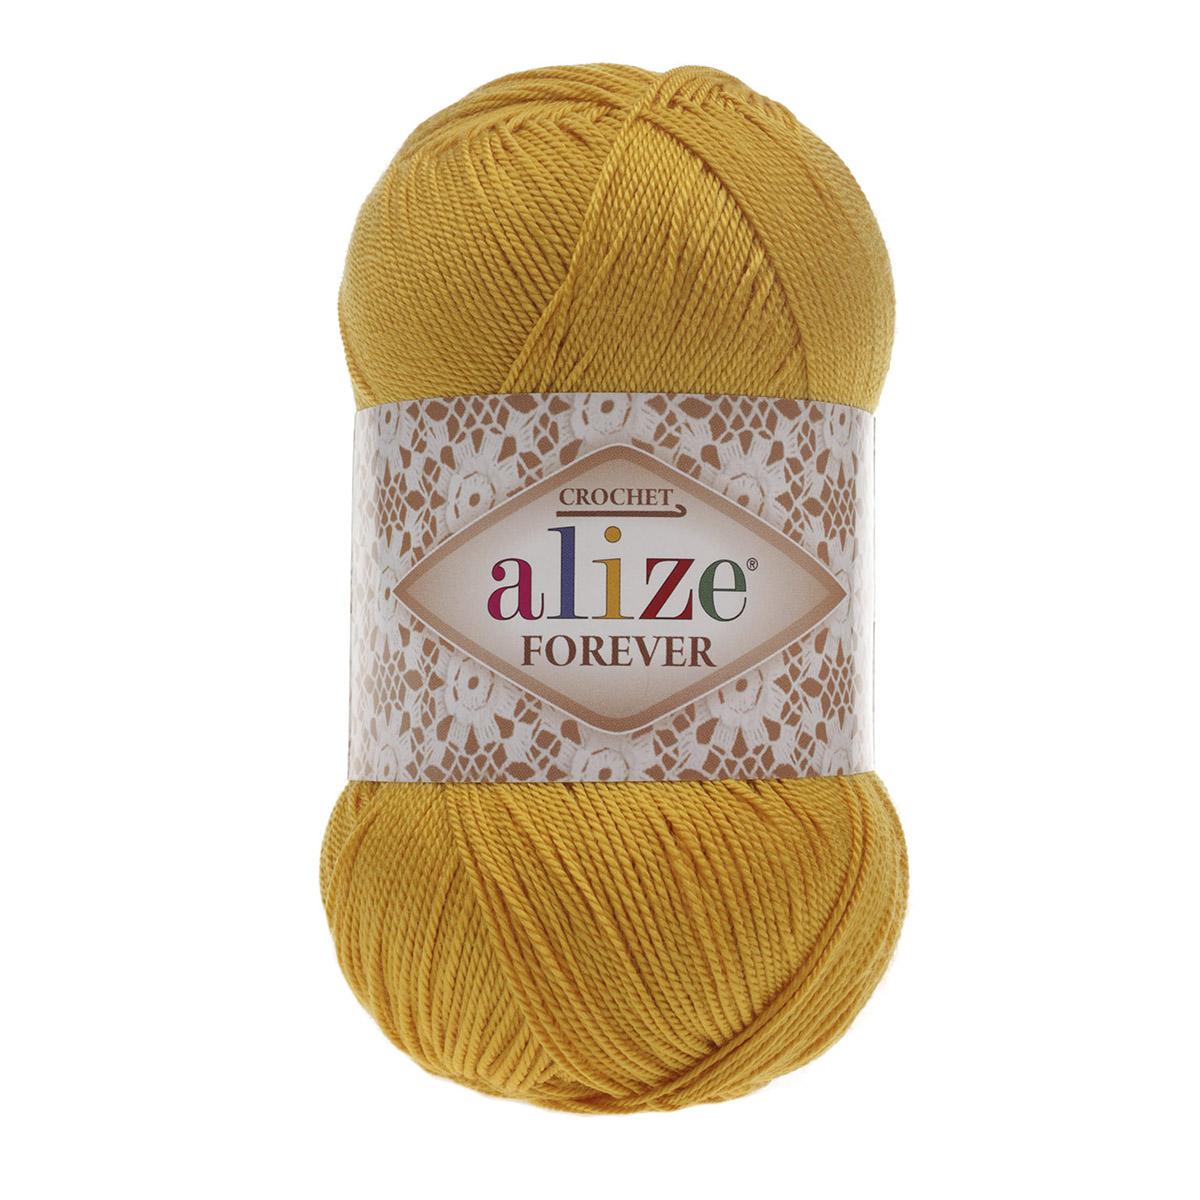 Пряжа ALIZE 'Forever crochet' 50гр. 300м. (100% микроакрил) ТУ (488 темно-желтый) фото